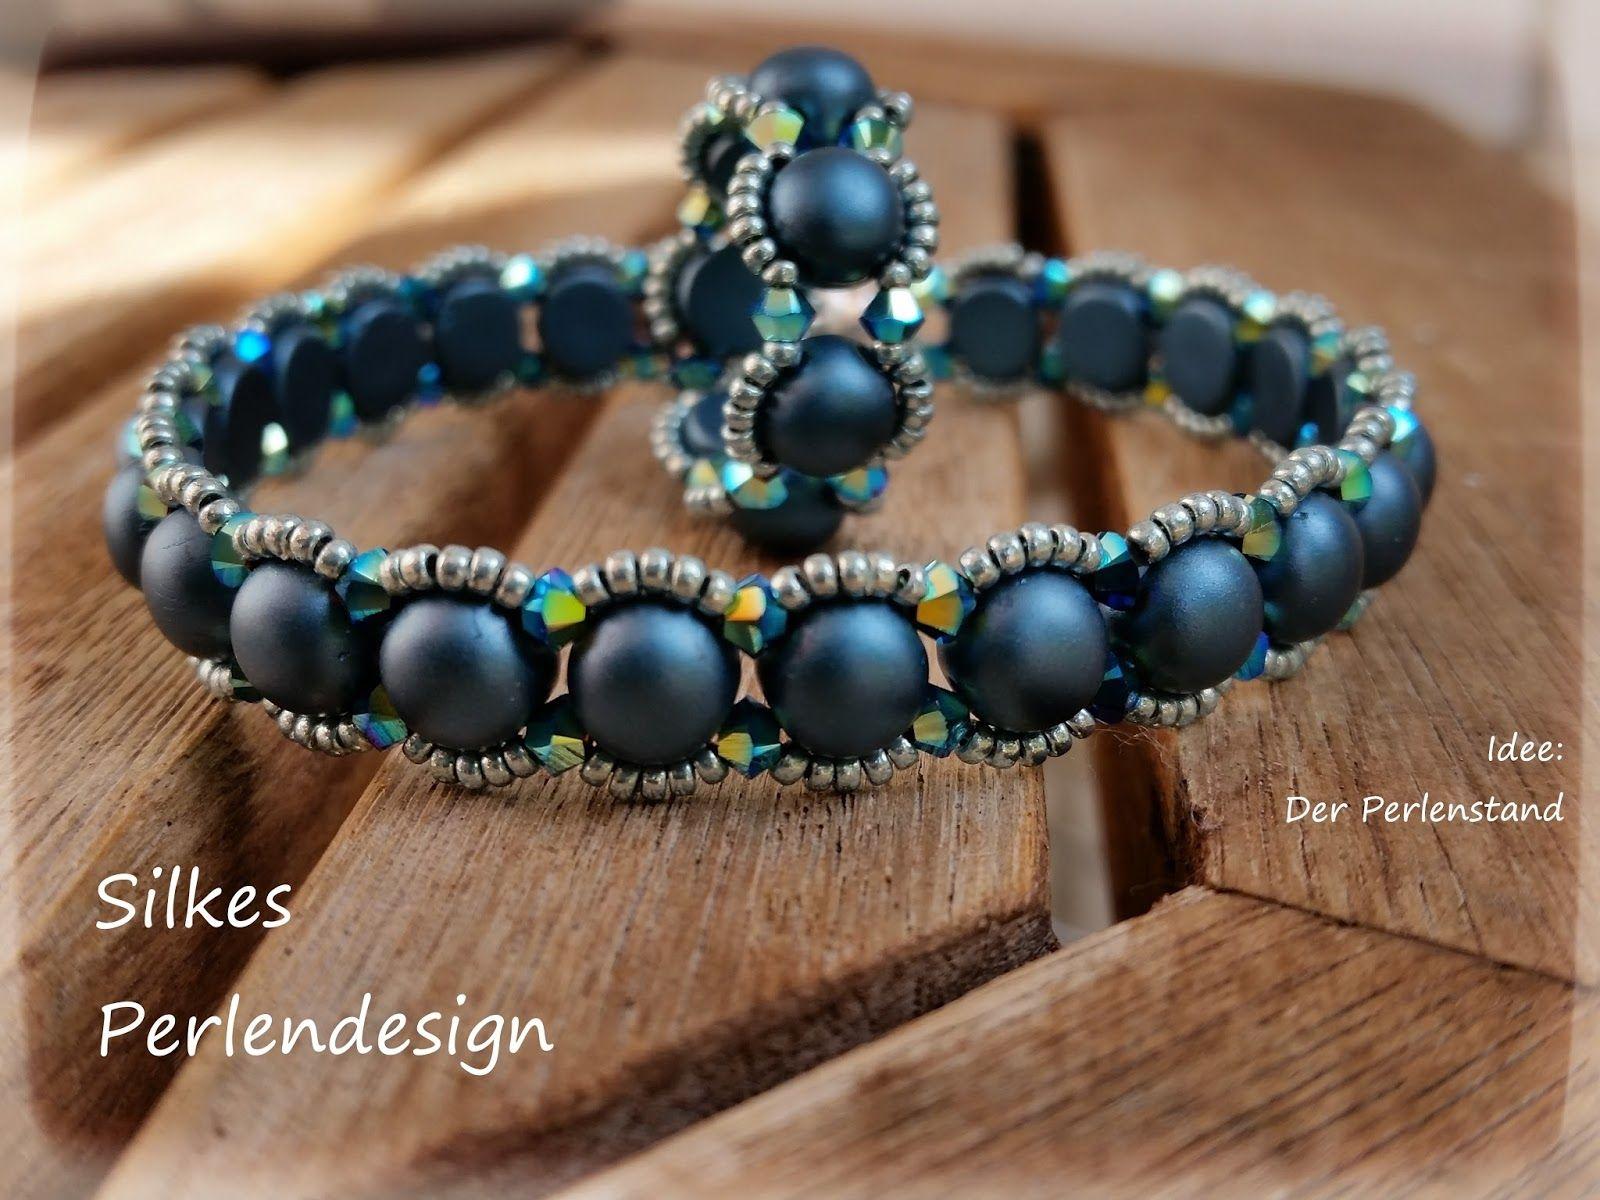 Silkes perlendesign schlichtheit mit 2 hole cabochons makramee pinterest schmuck armband - Perlenarmband basteln ...